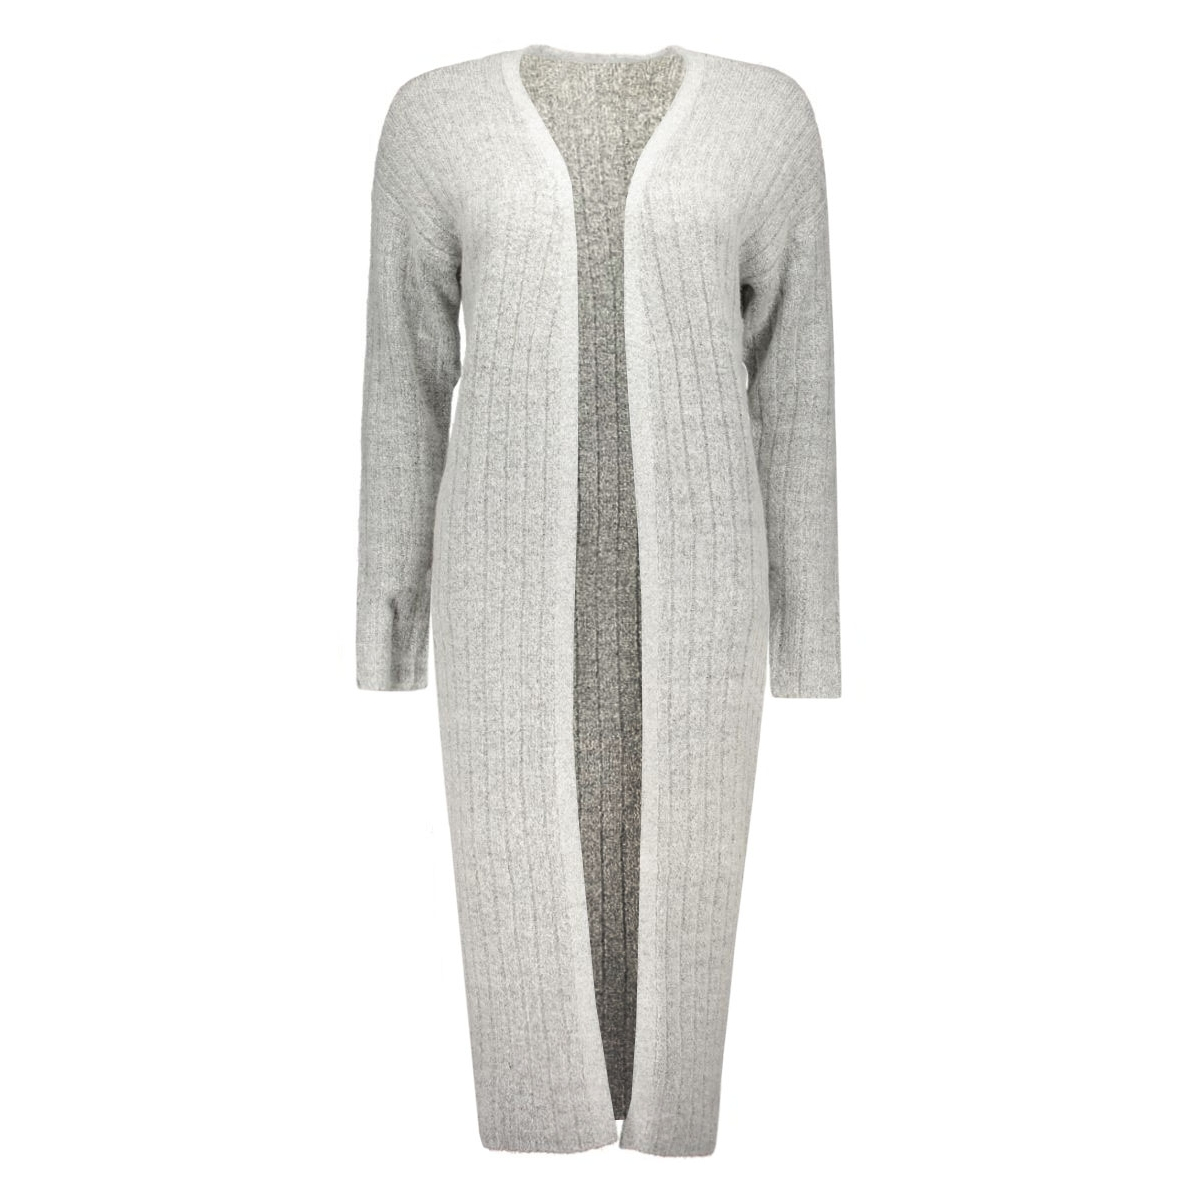 jdyraven l/s cardigan knt 15117353 jacqueline de yong vest light grey melange